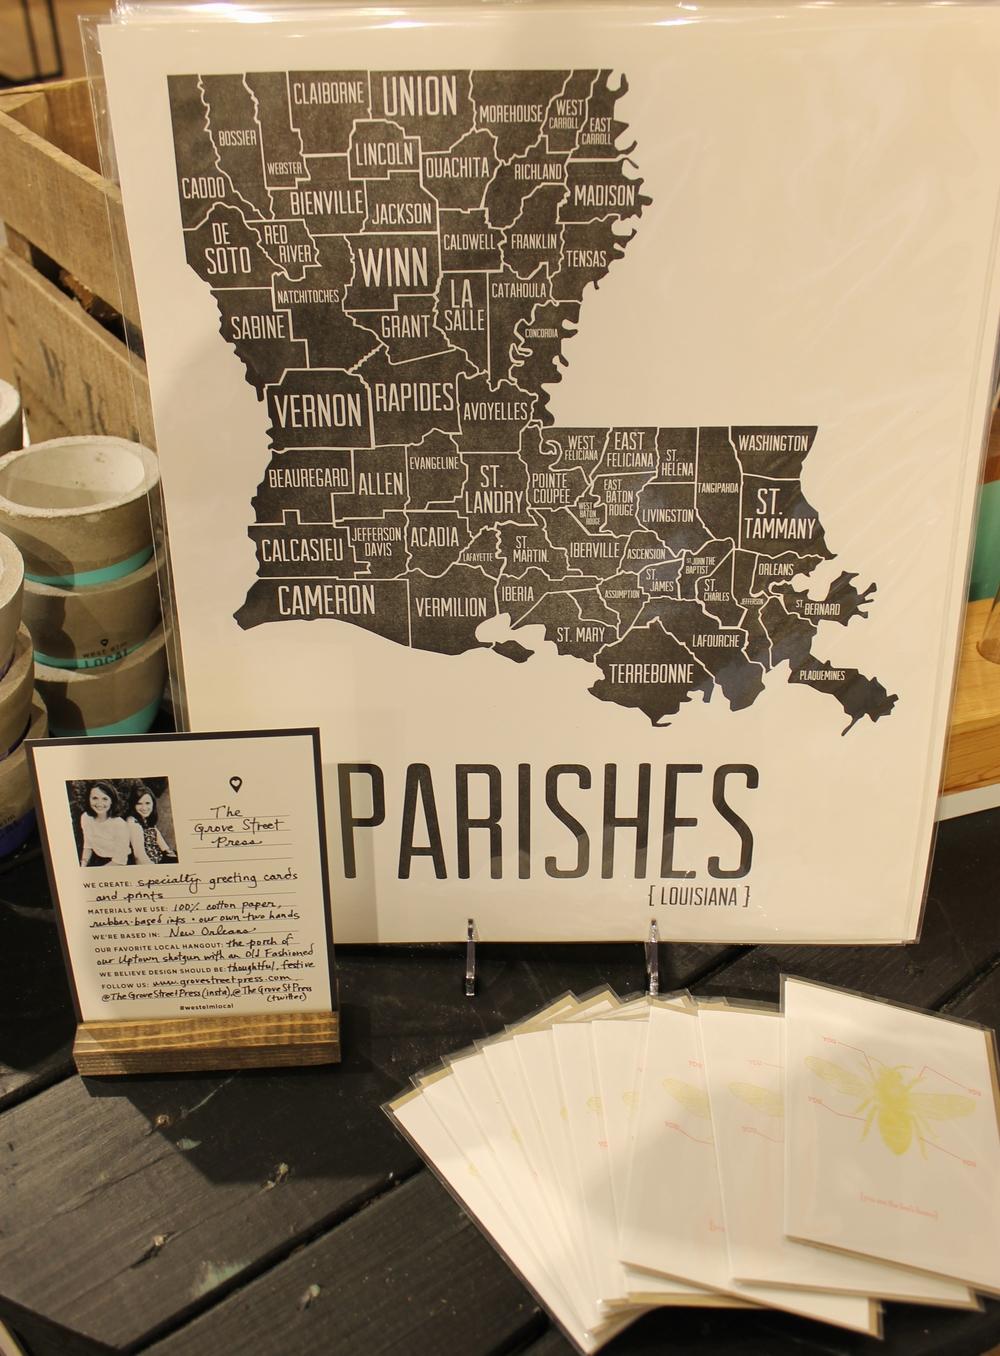 louisiana parishes.jpg